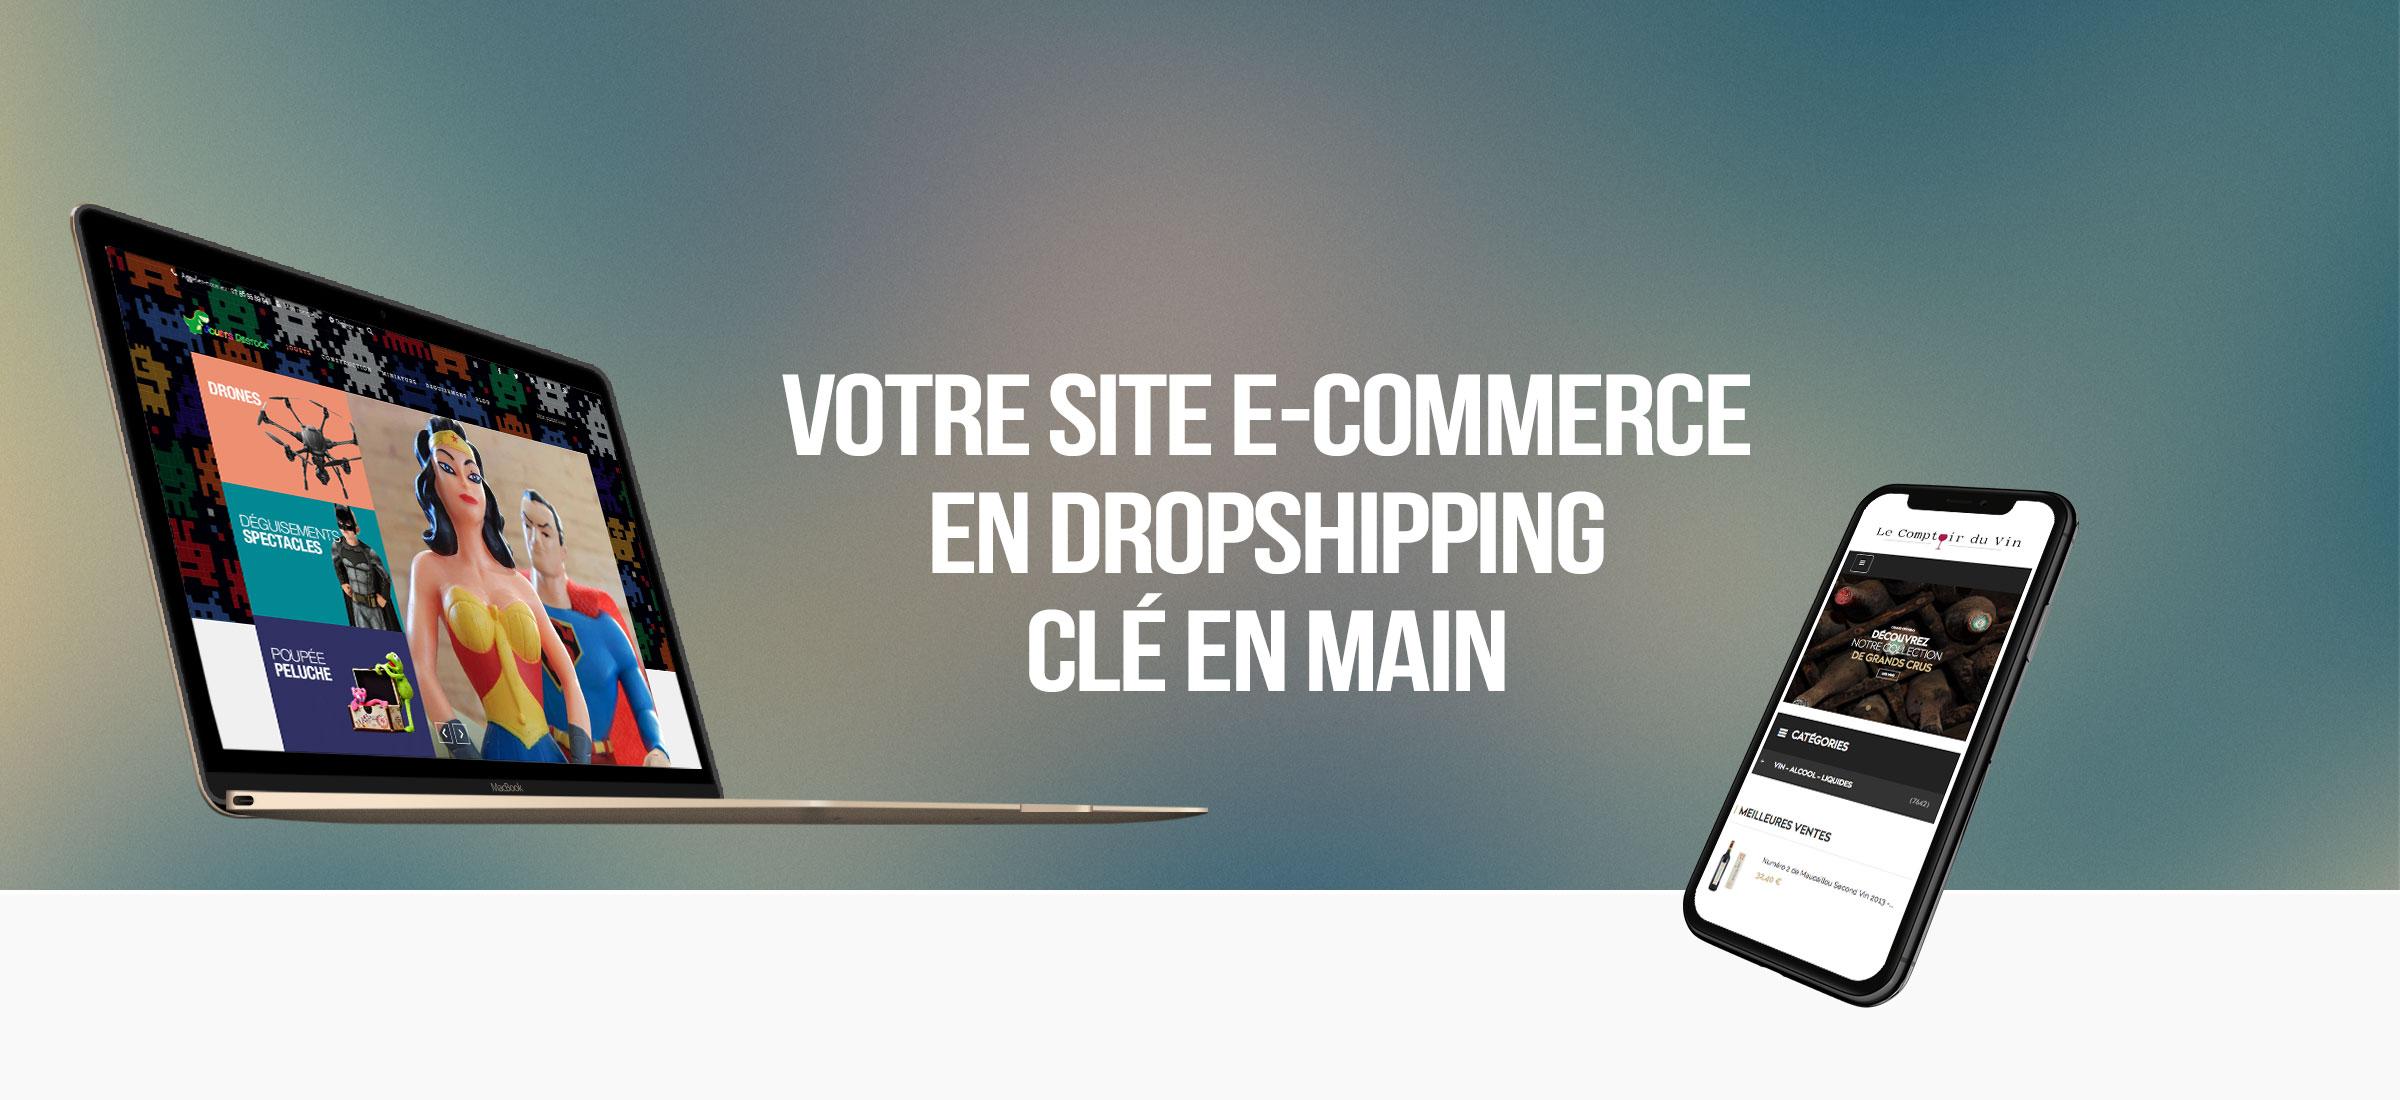 e-commerce dropshipping - site clé en main drop shipping